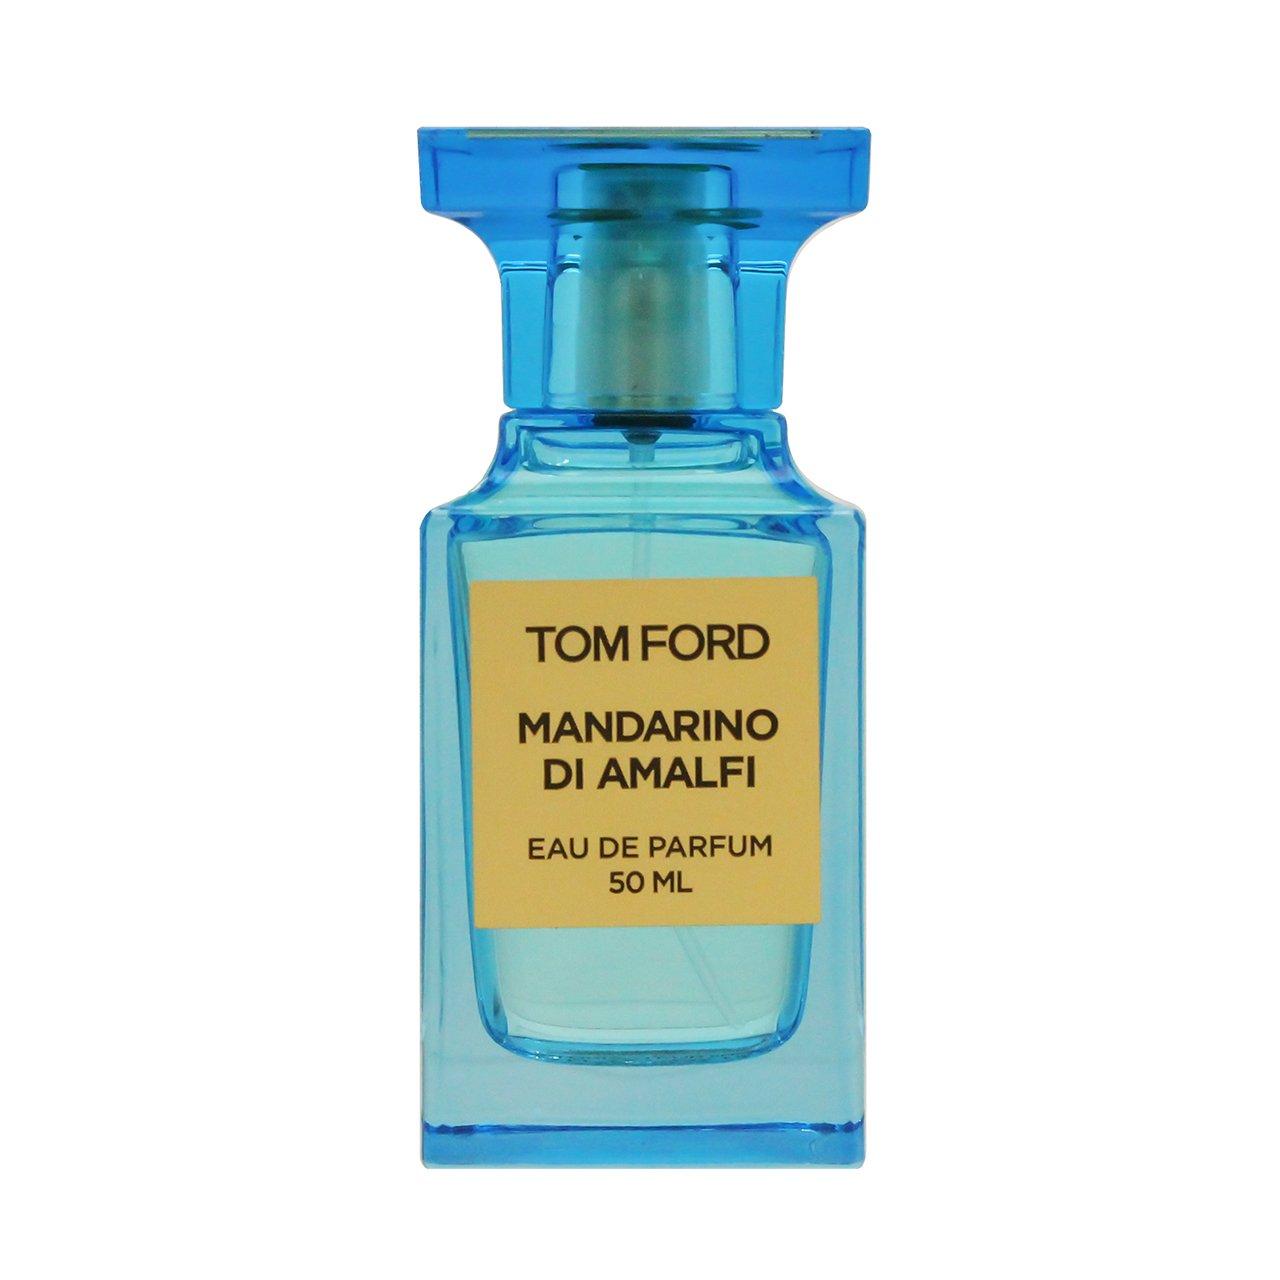 Parfum1 50ml Tom Di De Eau Amalfi Ford Mandarino 7oz ALj3R54q